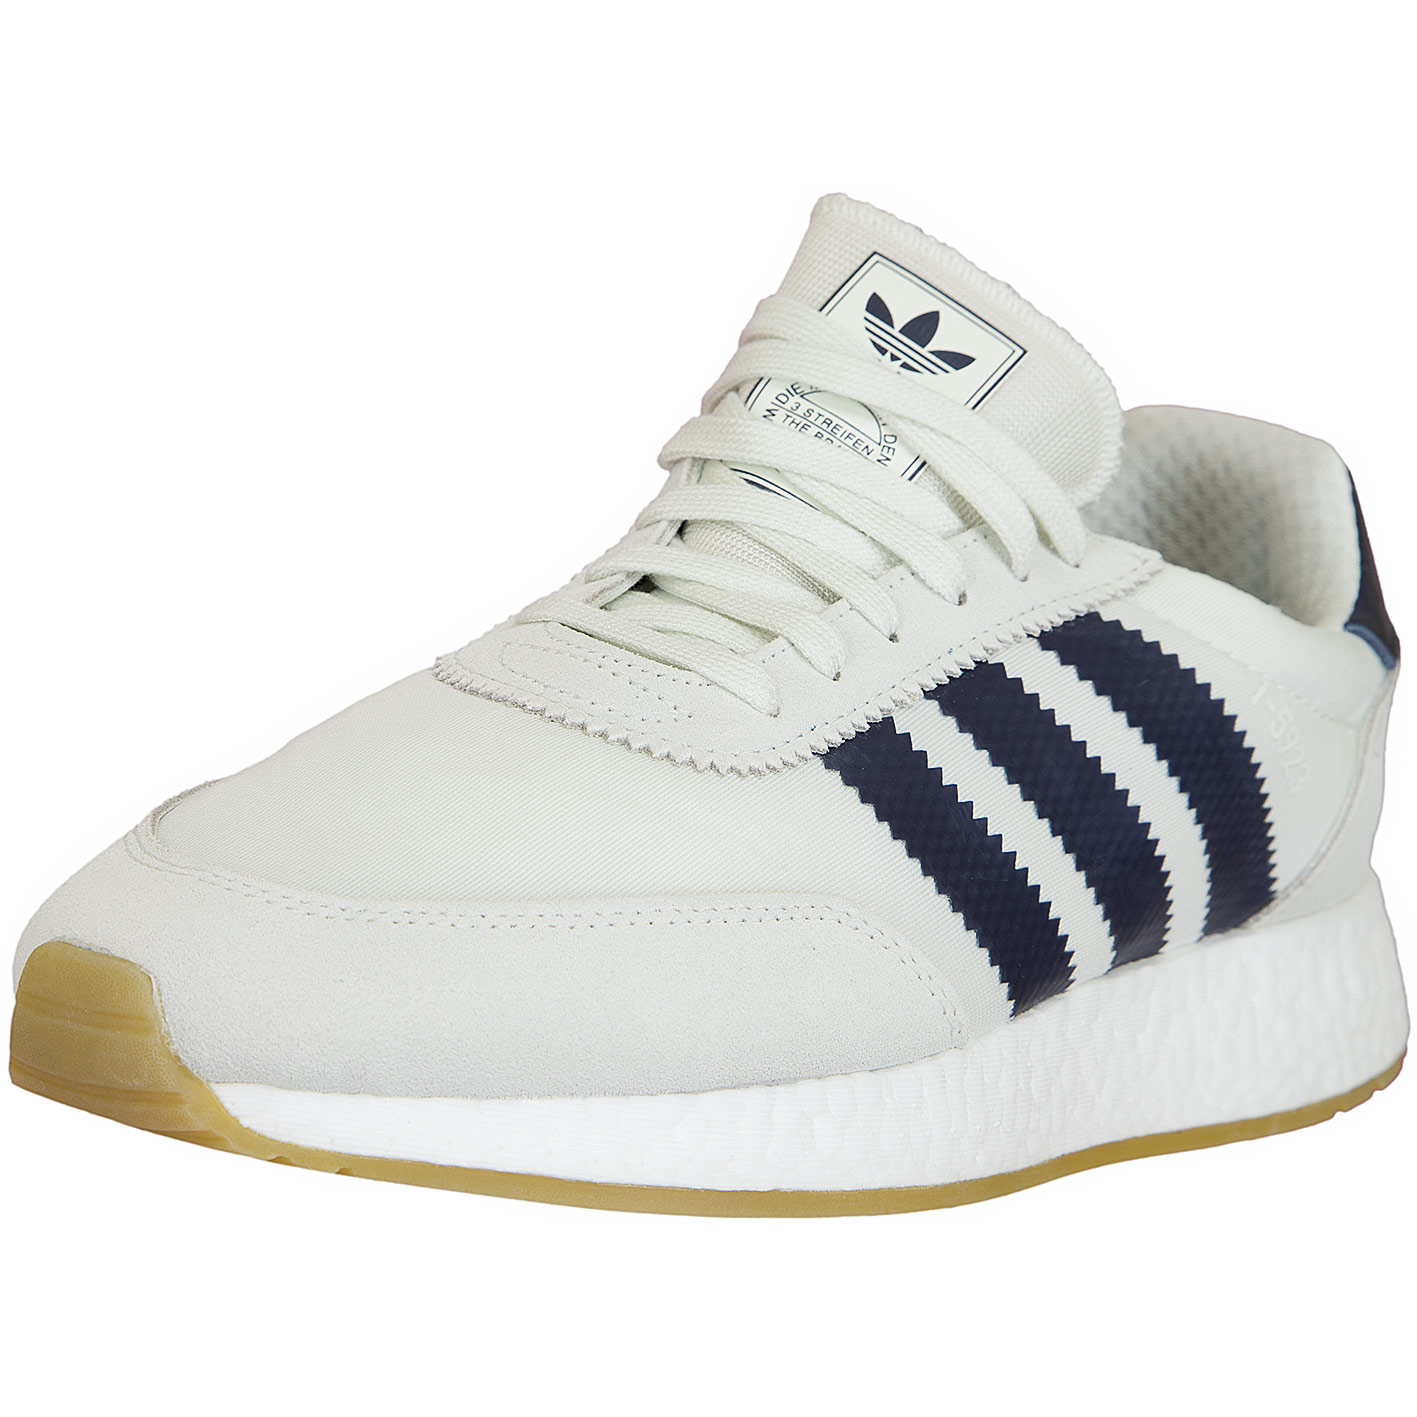 Sneaker Adidas I Originals 5923 Weißdunkelblau uTlK1F35Jc